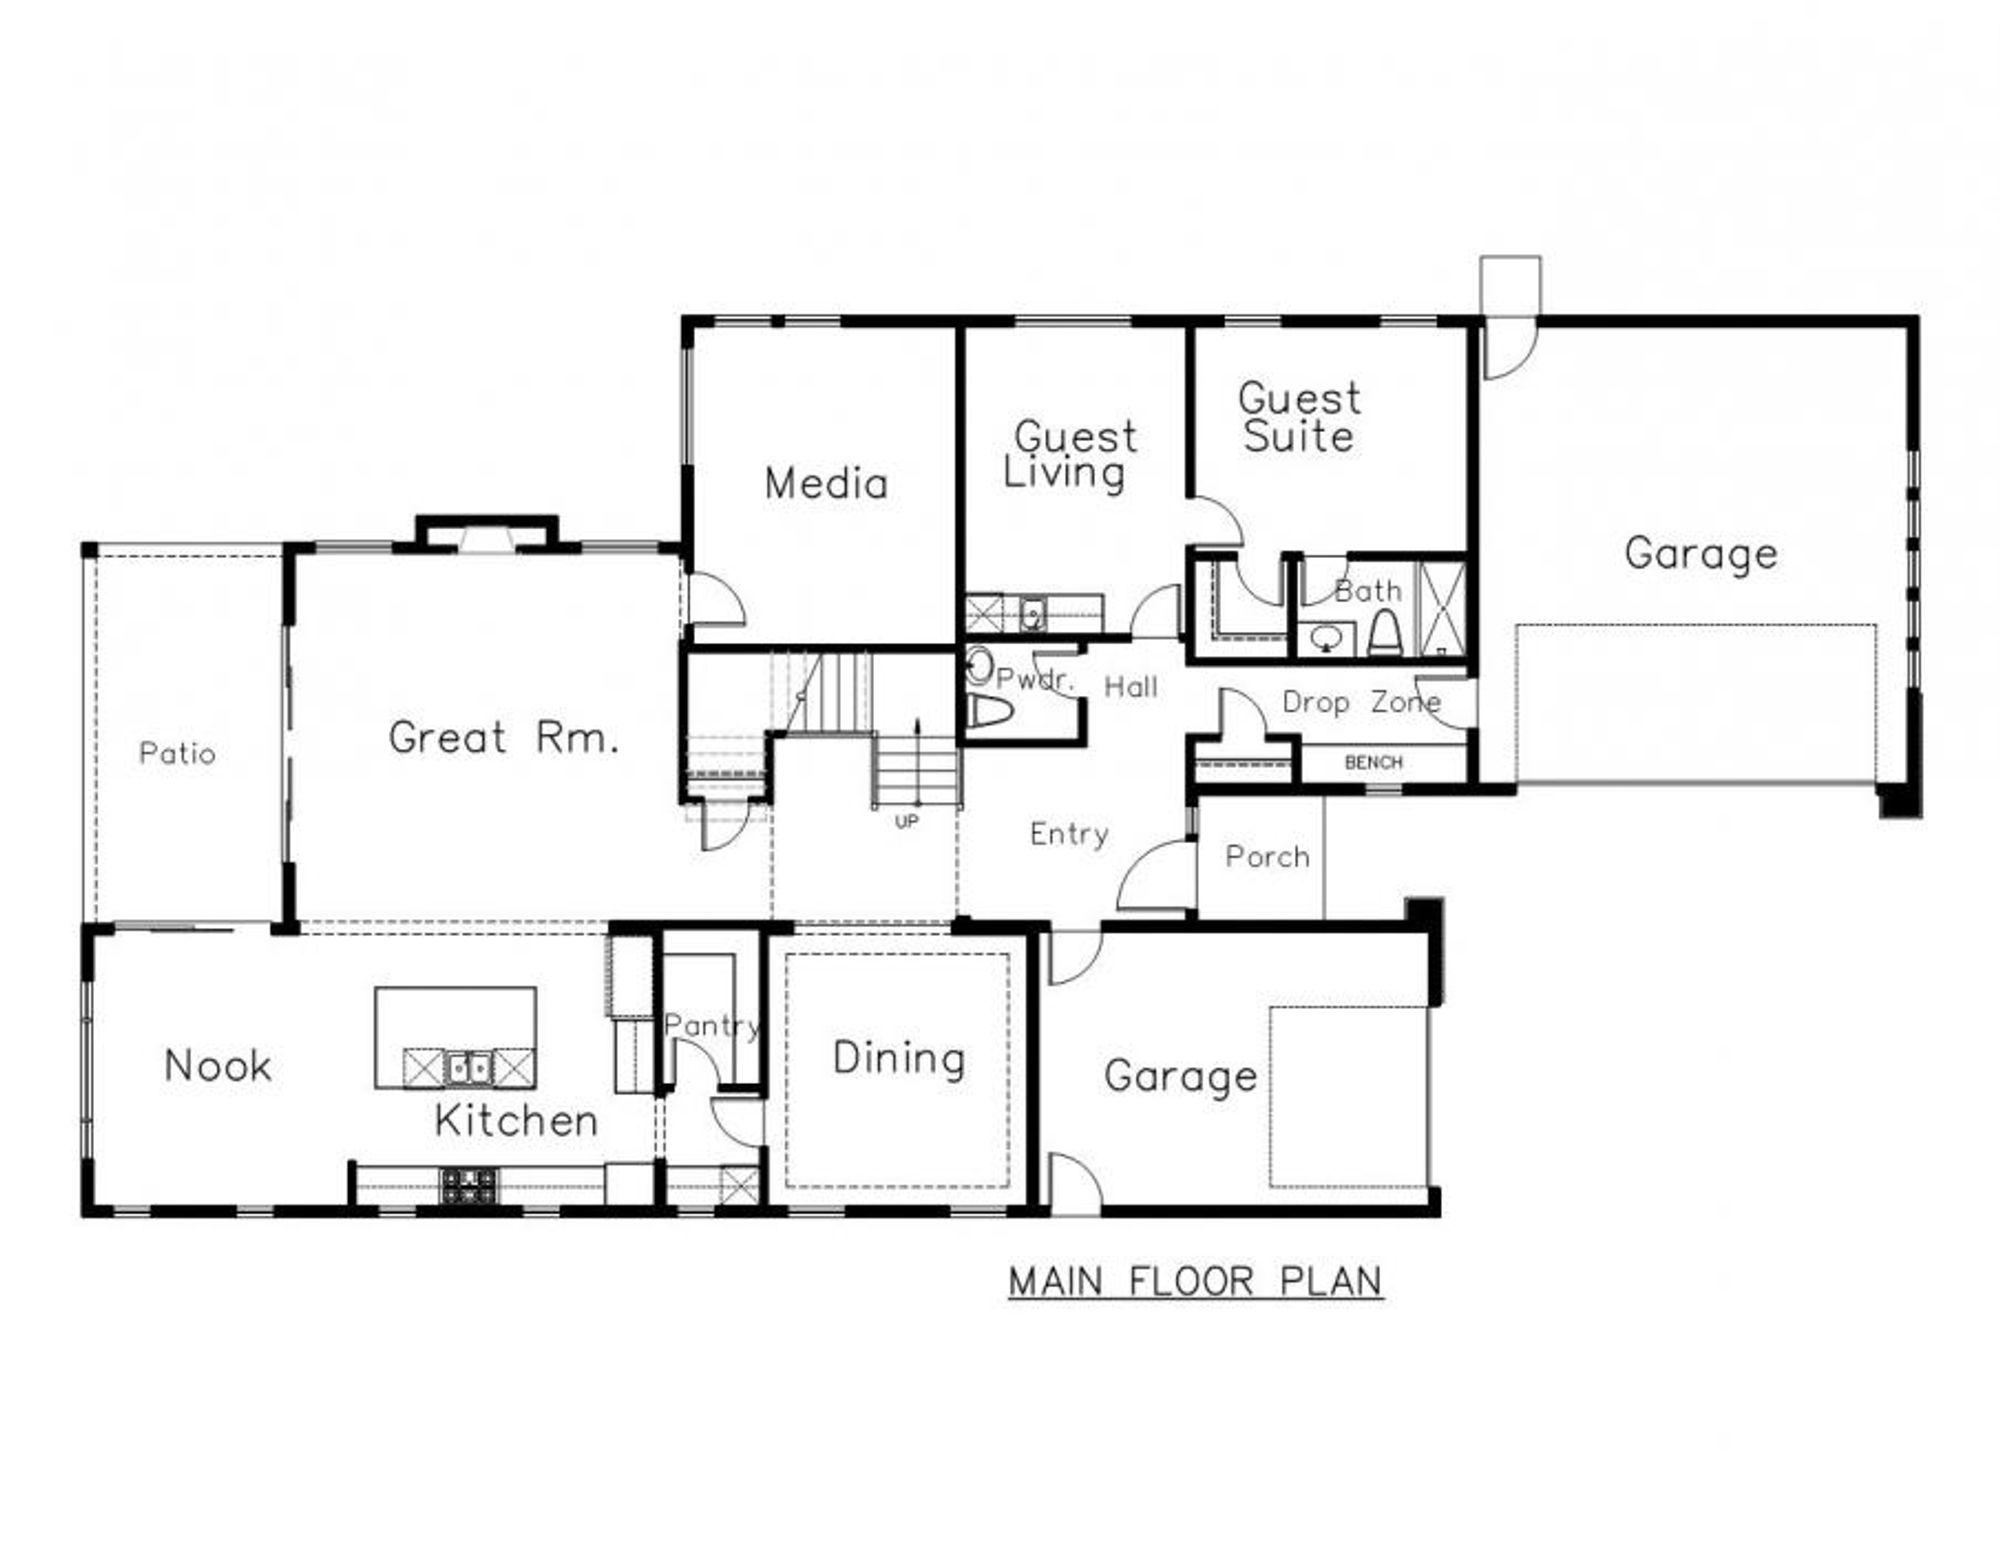 Sorrento Main Floor Plan